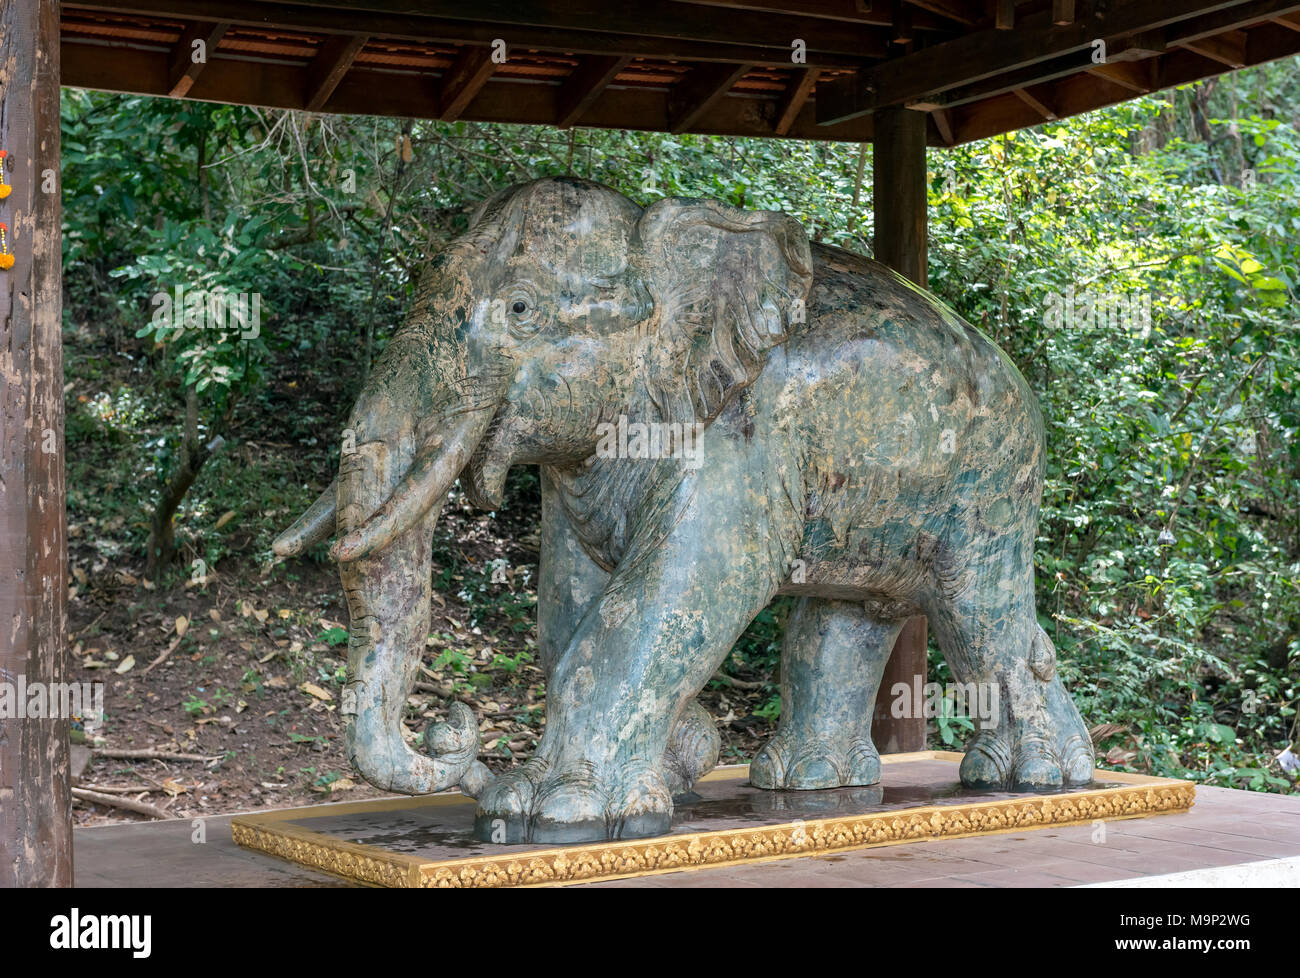 Elephant statue at Koh Ker Temple, Cambodia - Stock Image